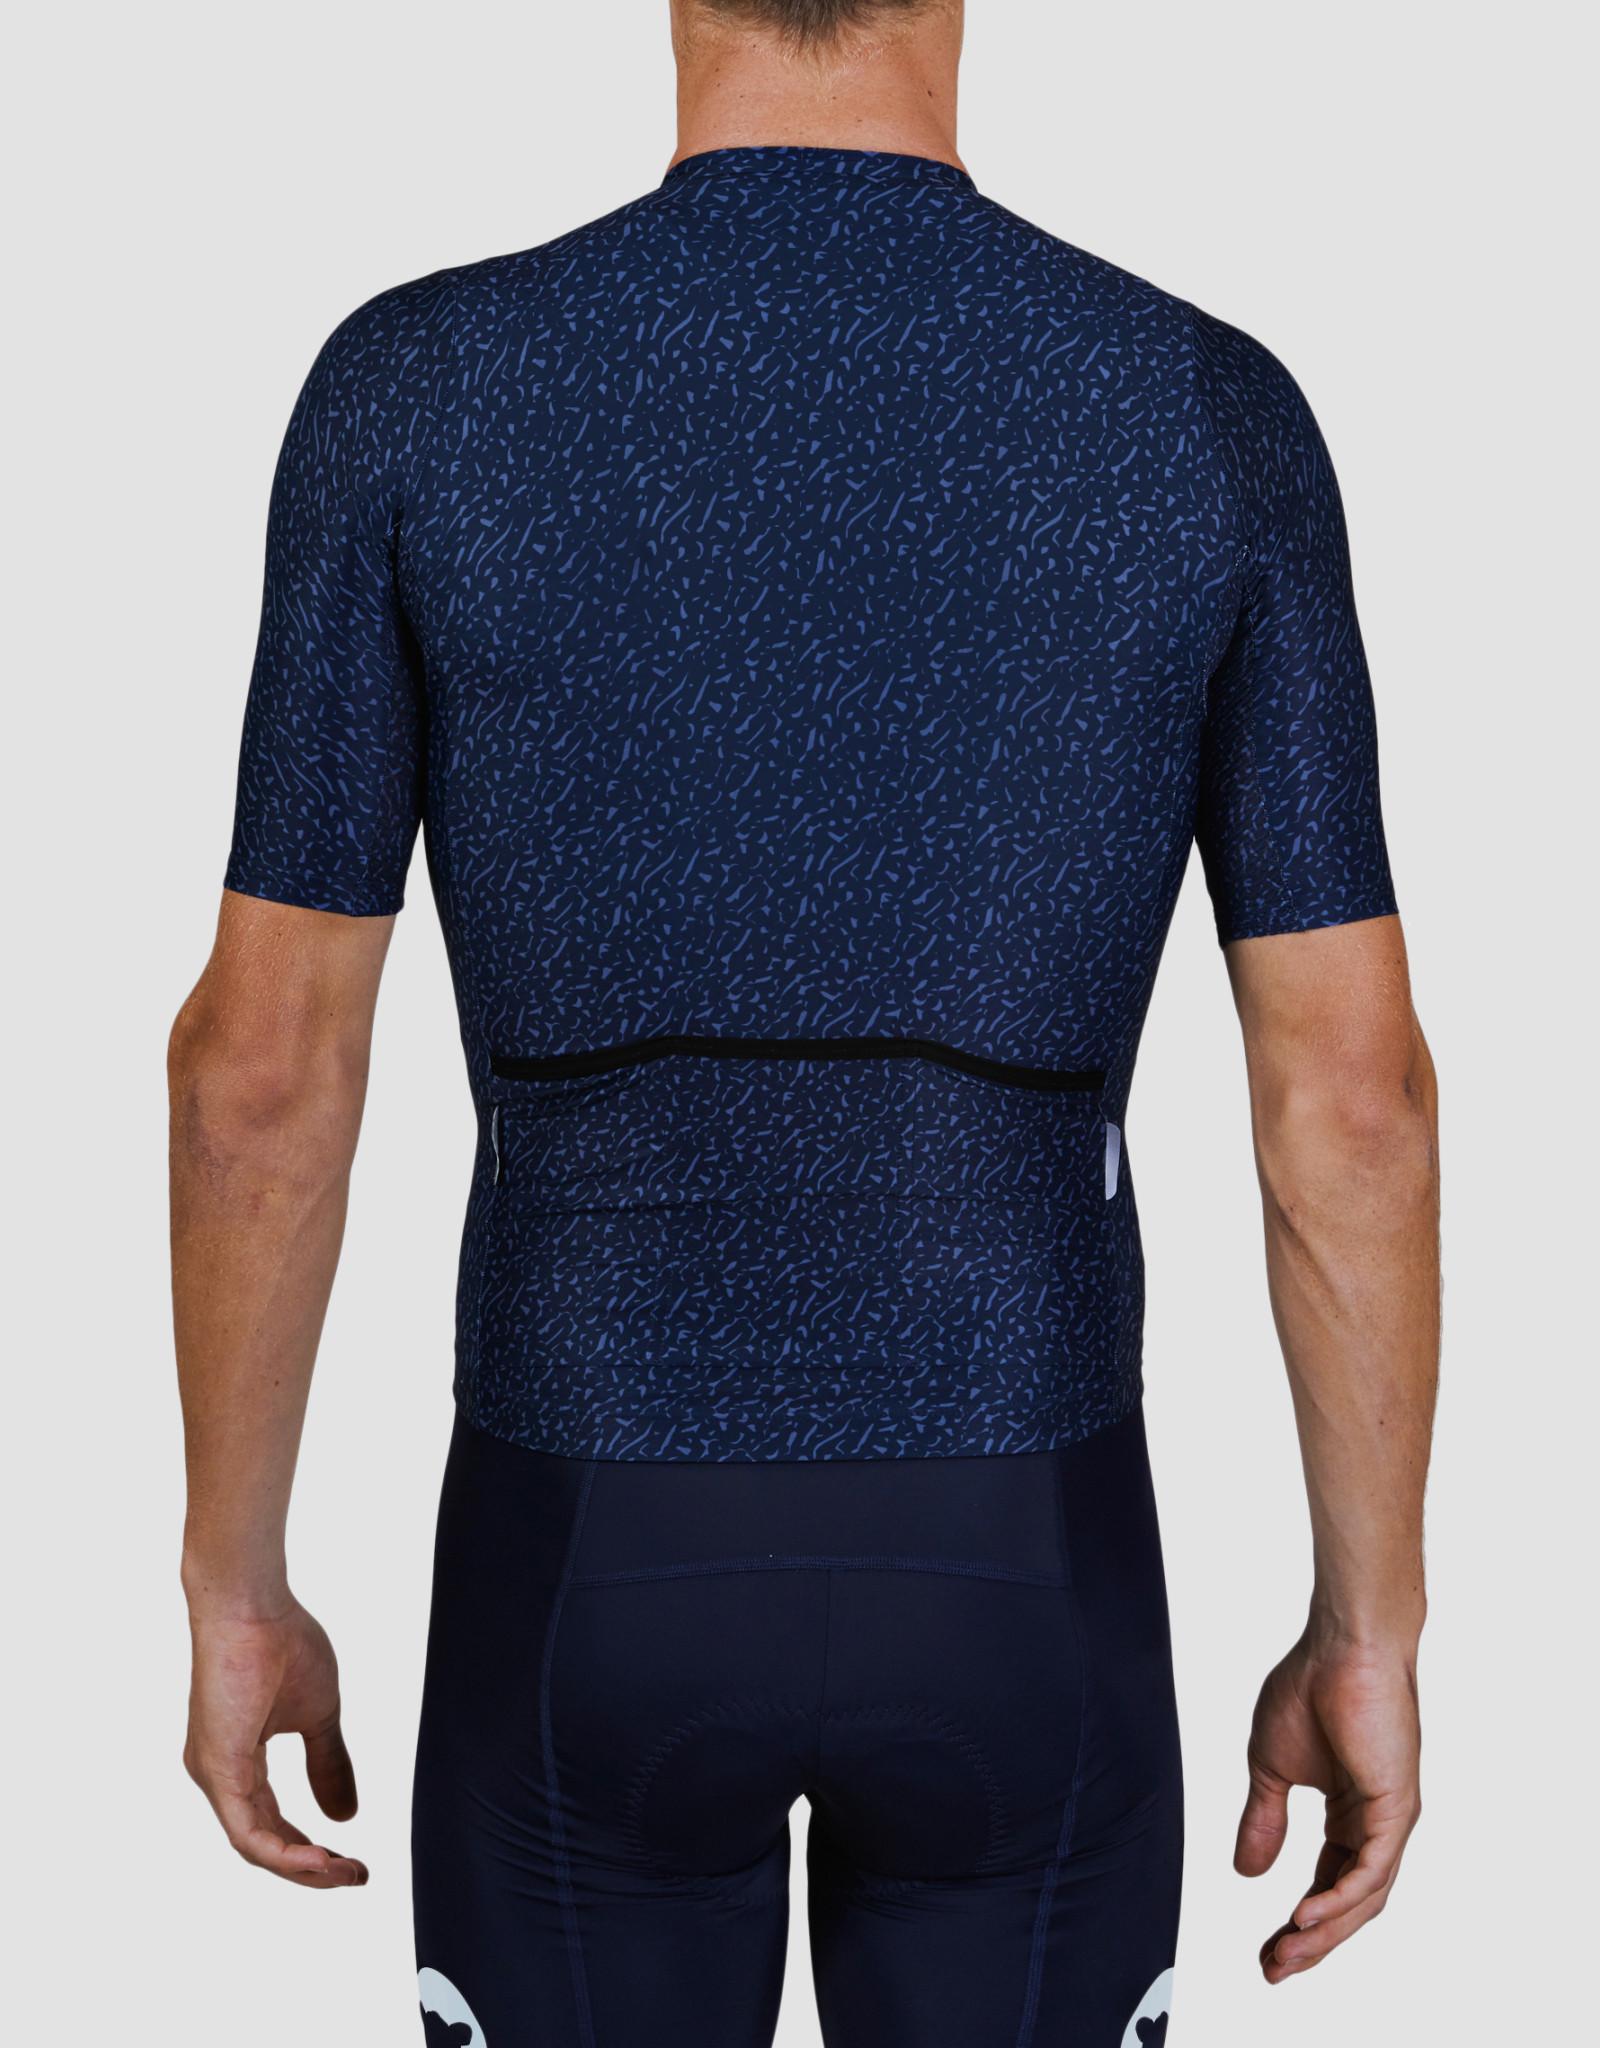 Black Sheep Cycling Men's Essentials TEAM jersey - Texture Midnight